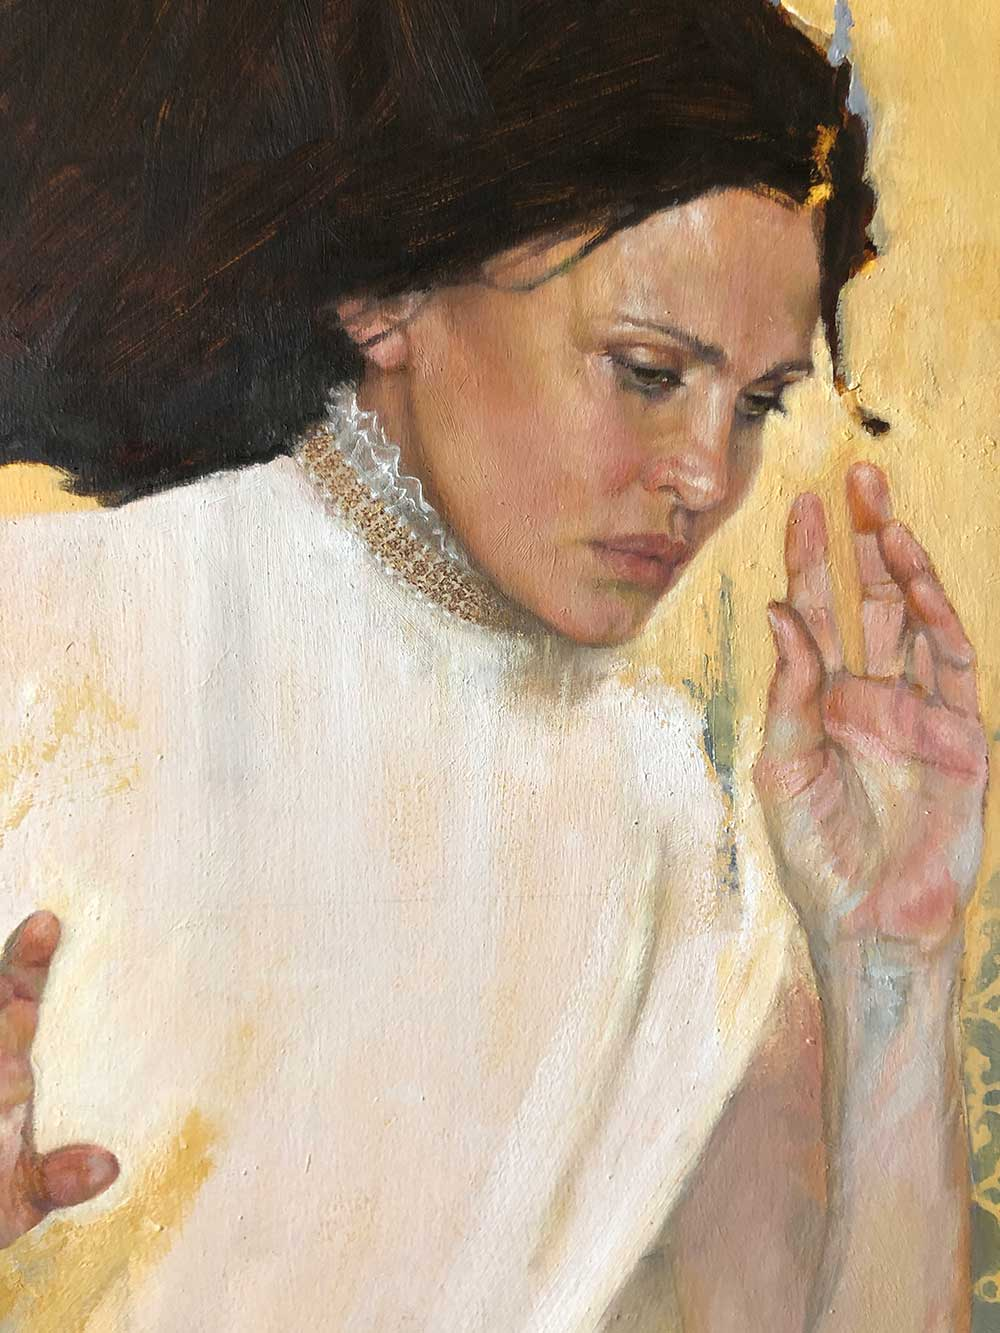 justina-vail-evans-art-she-held-us-3